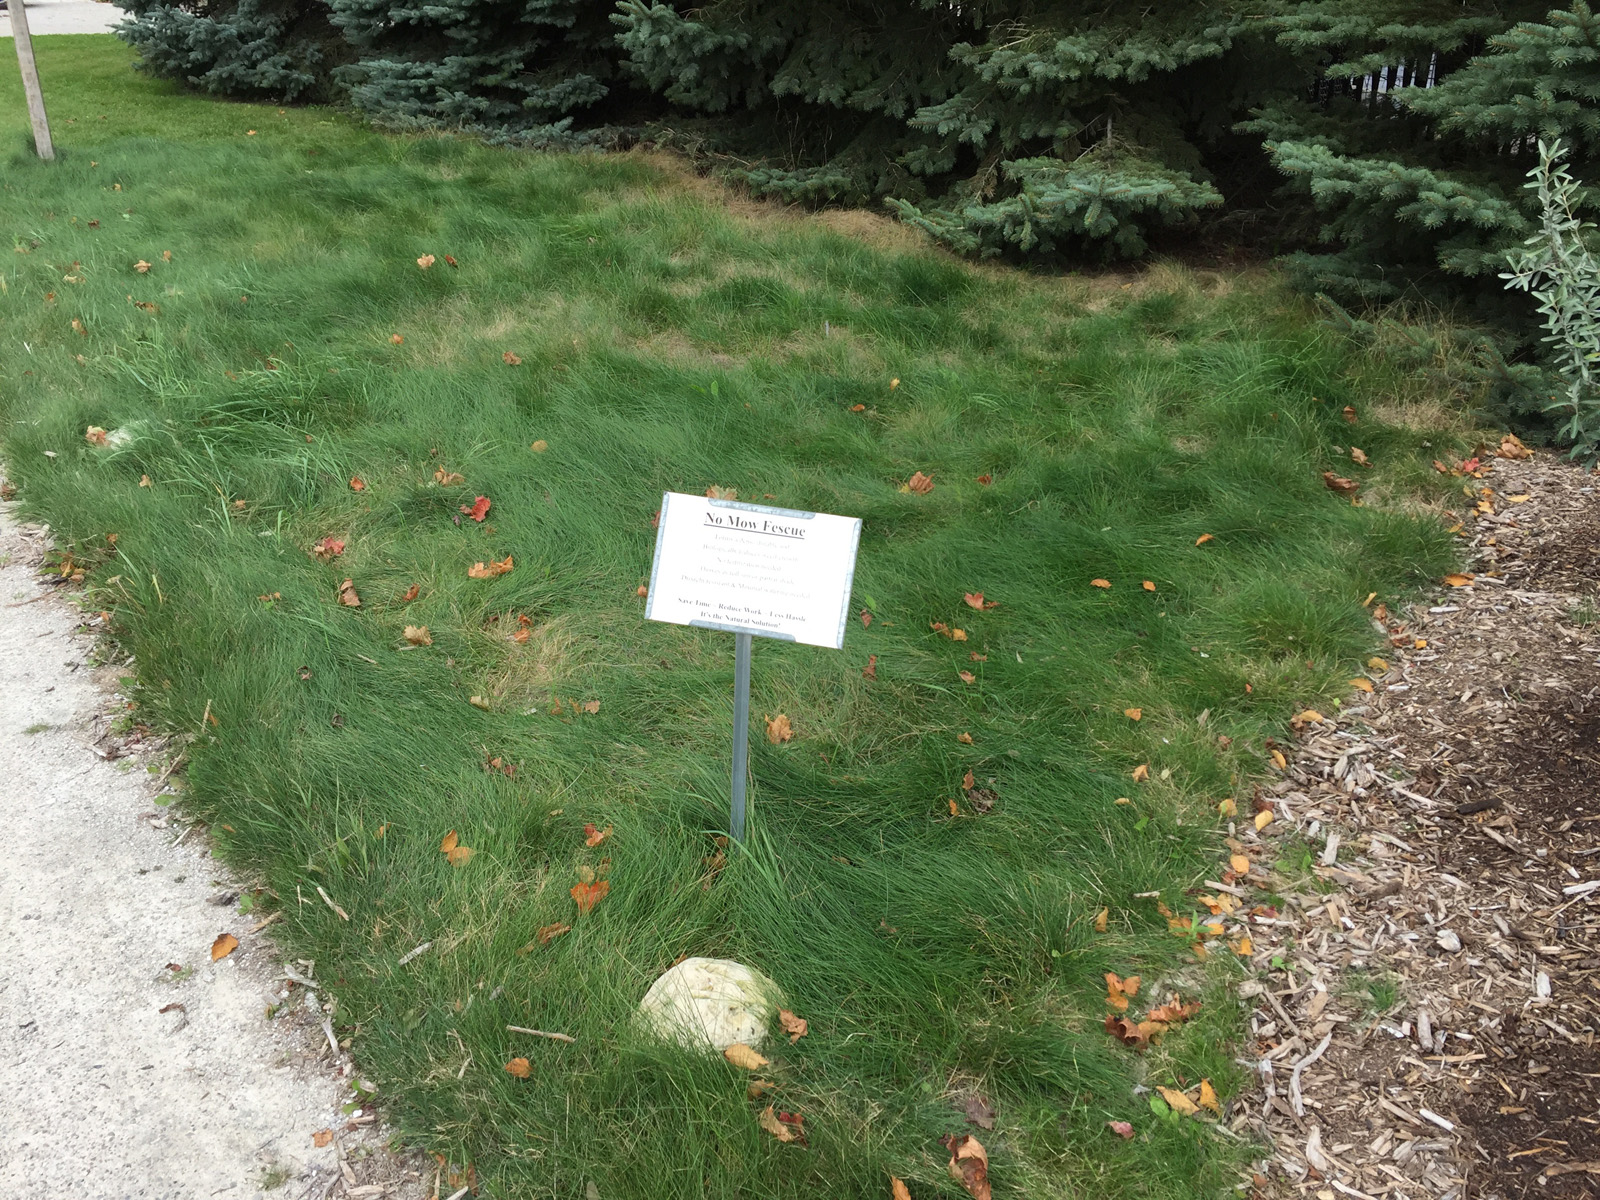 No-Mow Fescue demonstration plot at Door Landscape, photo taken October 2015